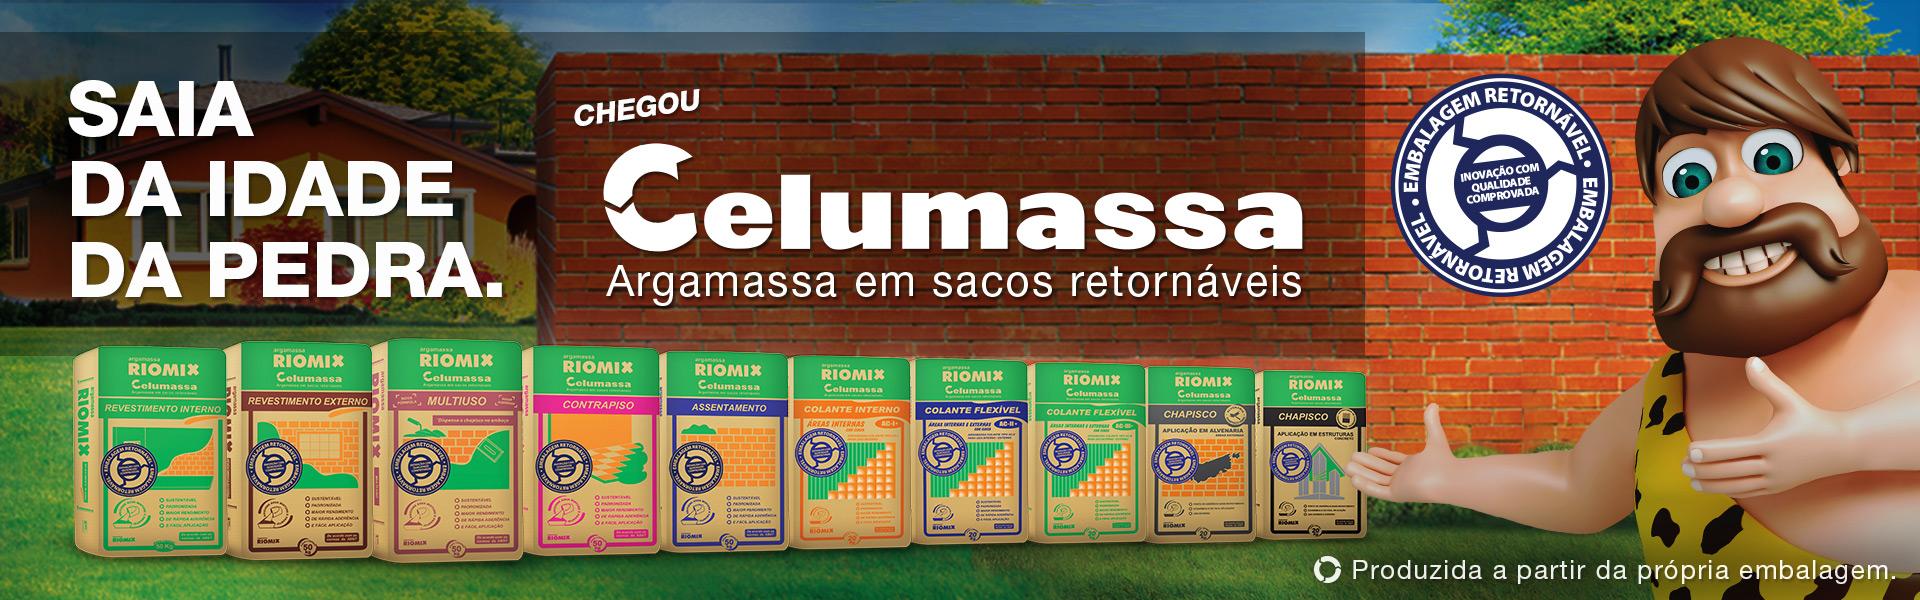 Banner - Celumassa